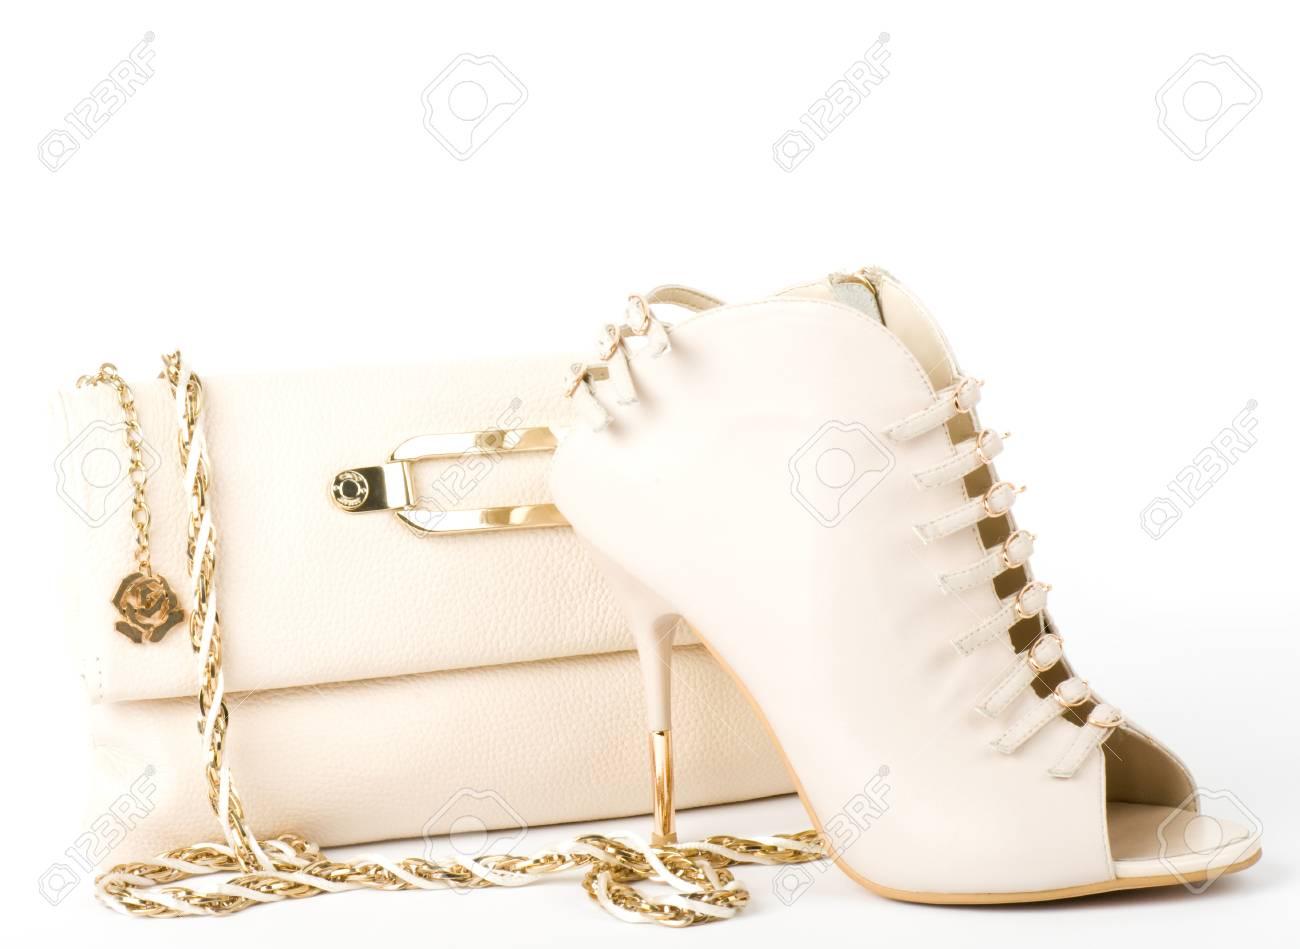 Sexy fashionable shoe and handbag isolated Stock Photo - 13236141